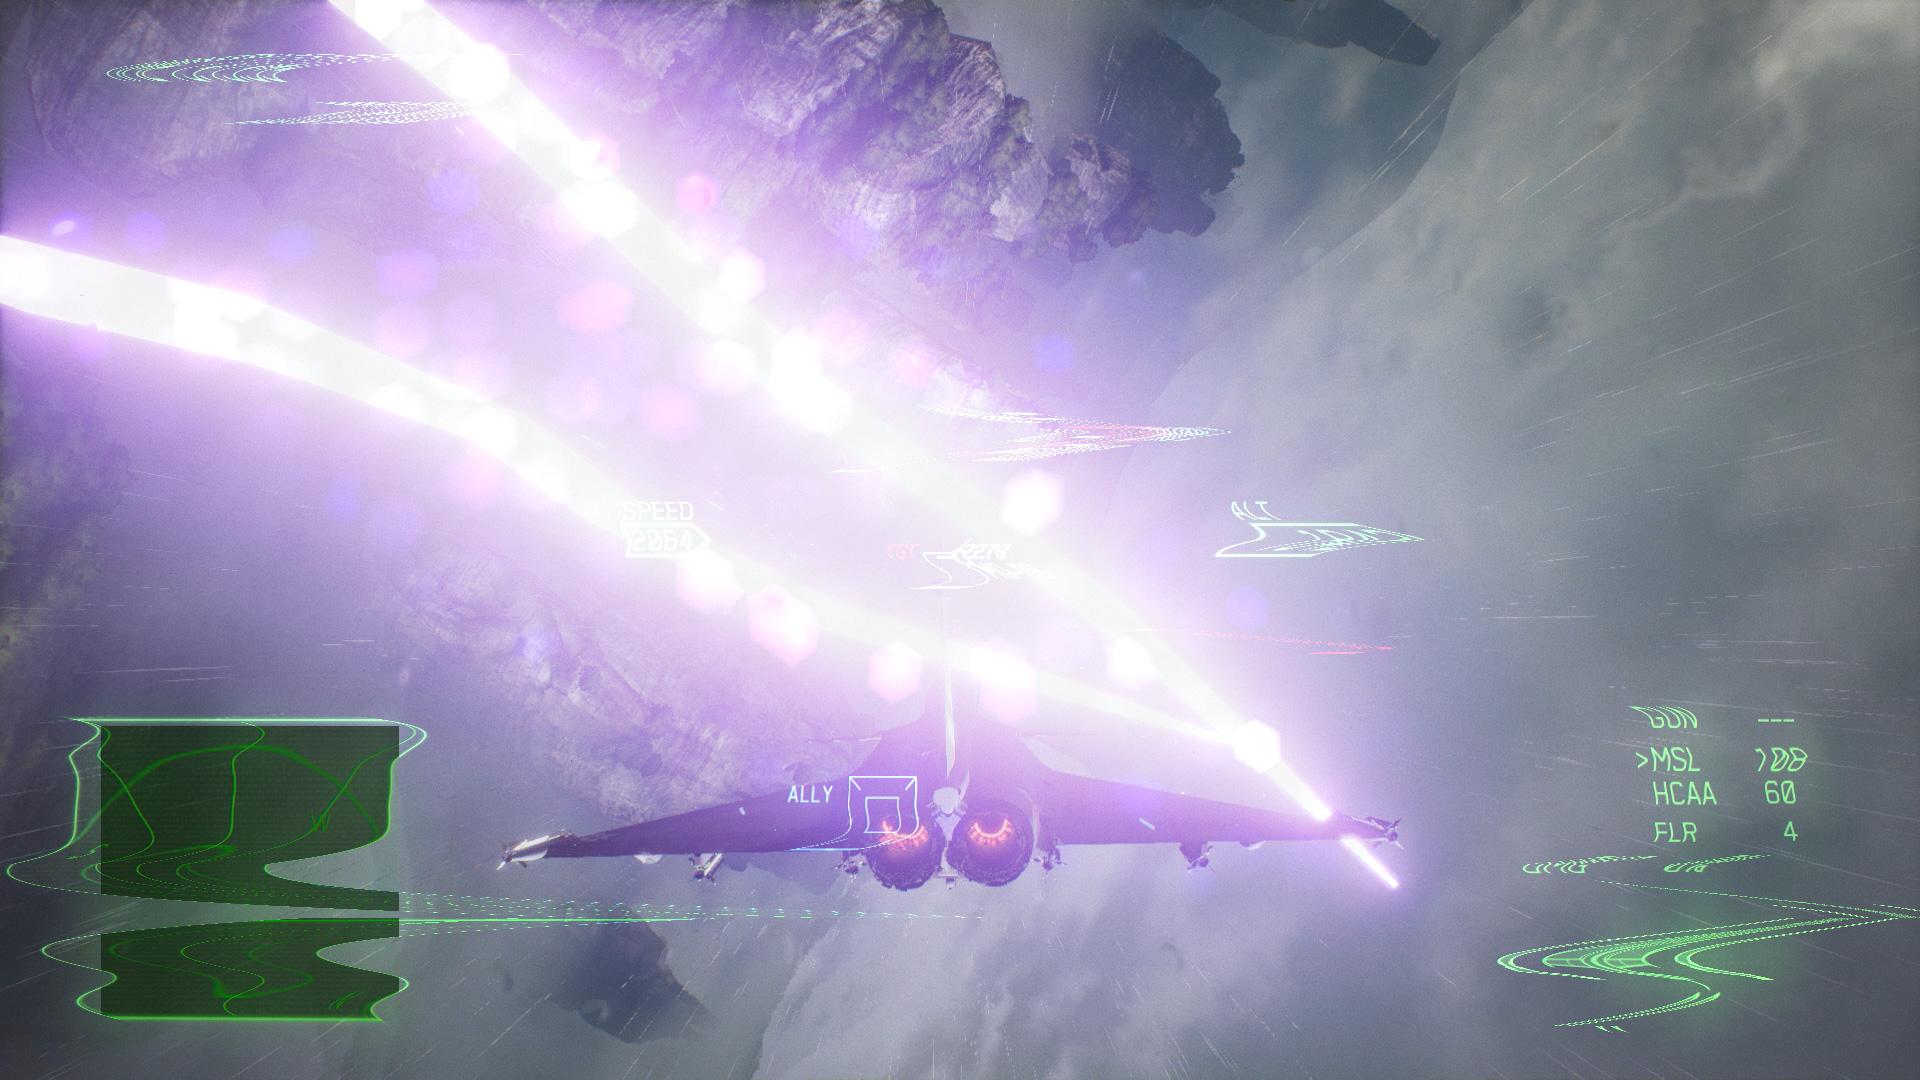 http://www.idgtv.es/archivos/201806/ace-combat-7-skies-unknown-img1.jpg